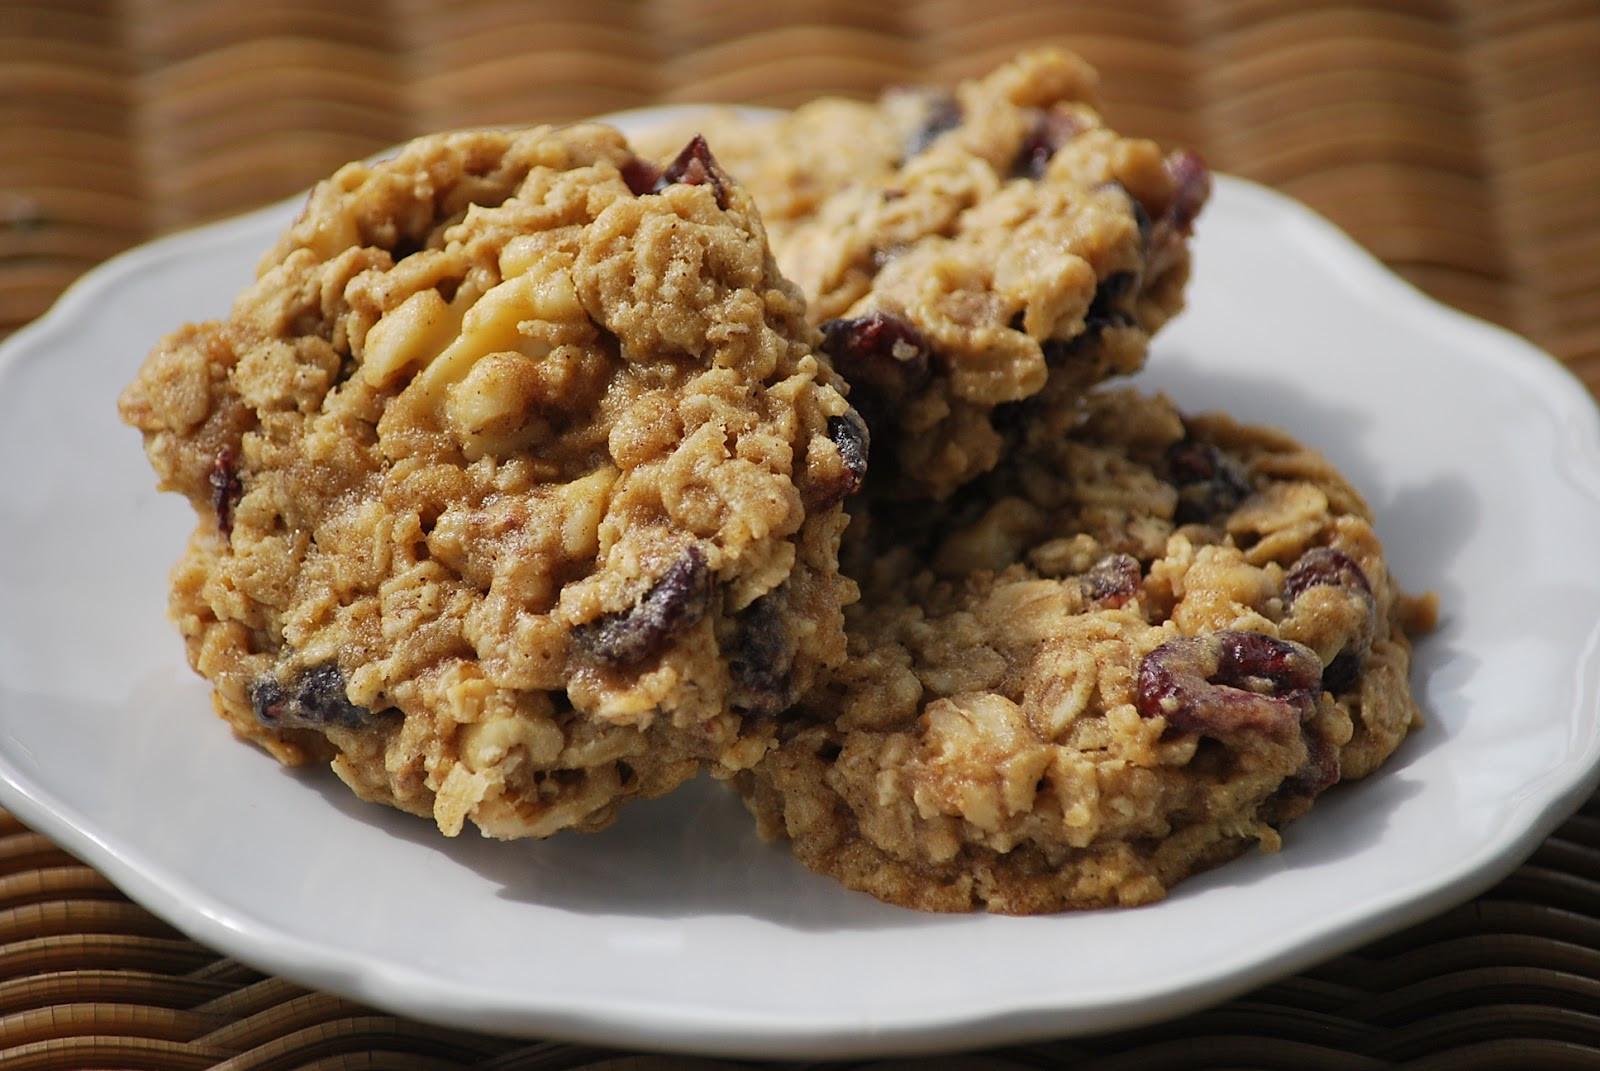 Vegan Cookie Recipes  My story in recipes She s gone vegan